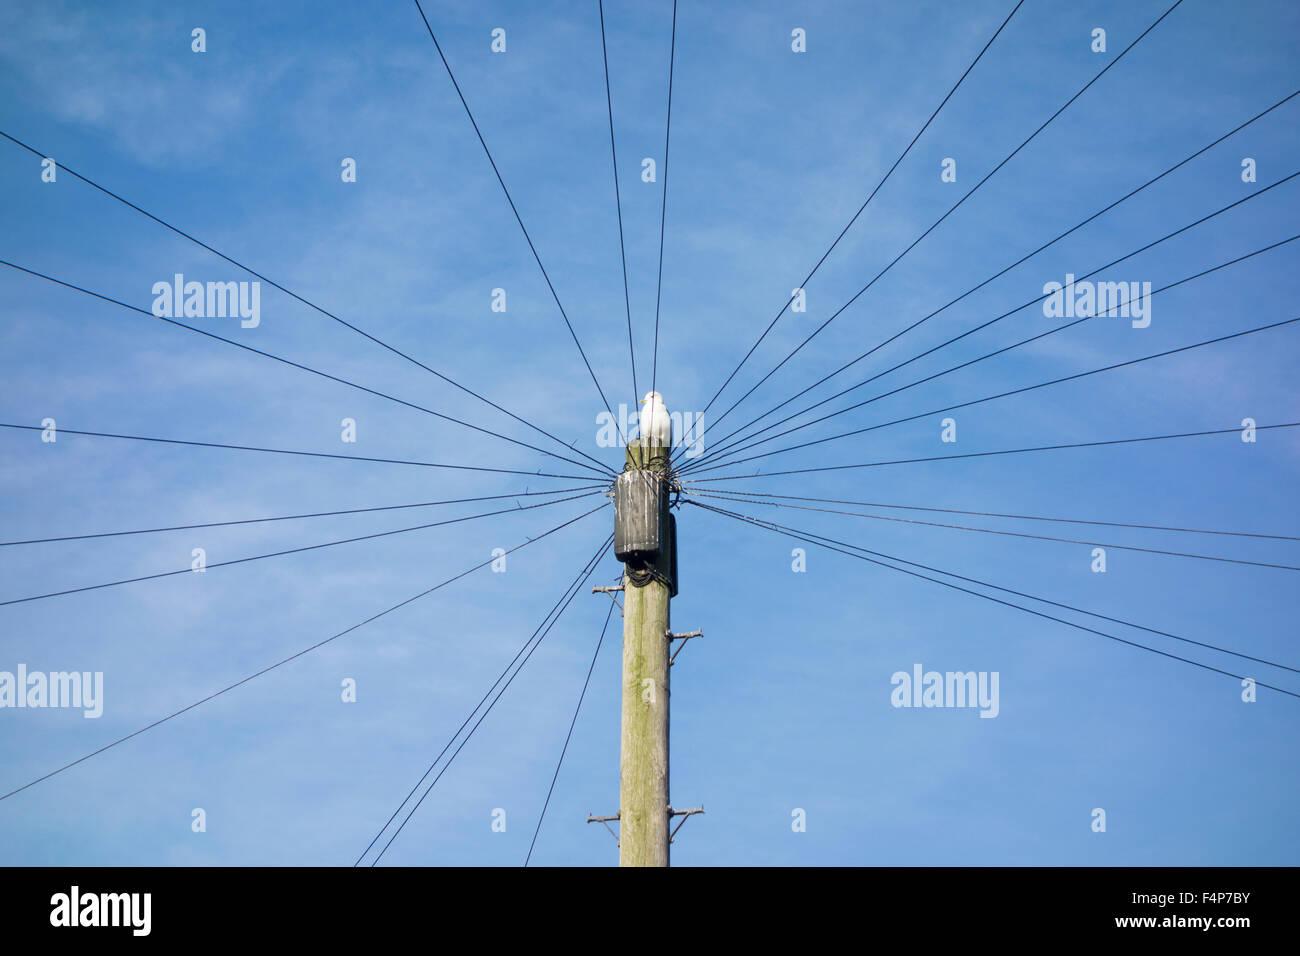 Uk Telephone Pole Wiring - Circuit Wiring And Diagram Hub •